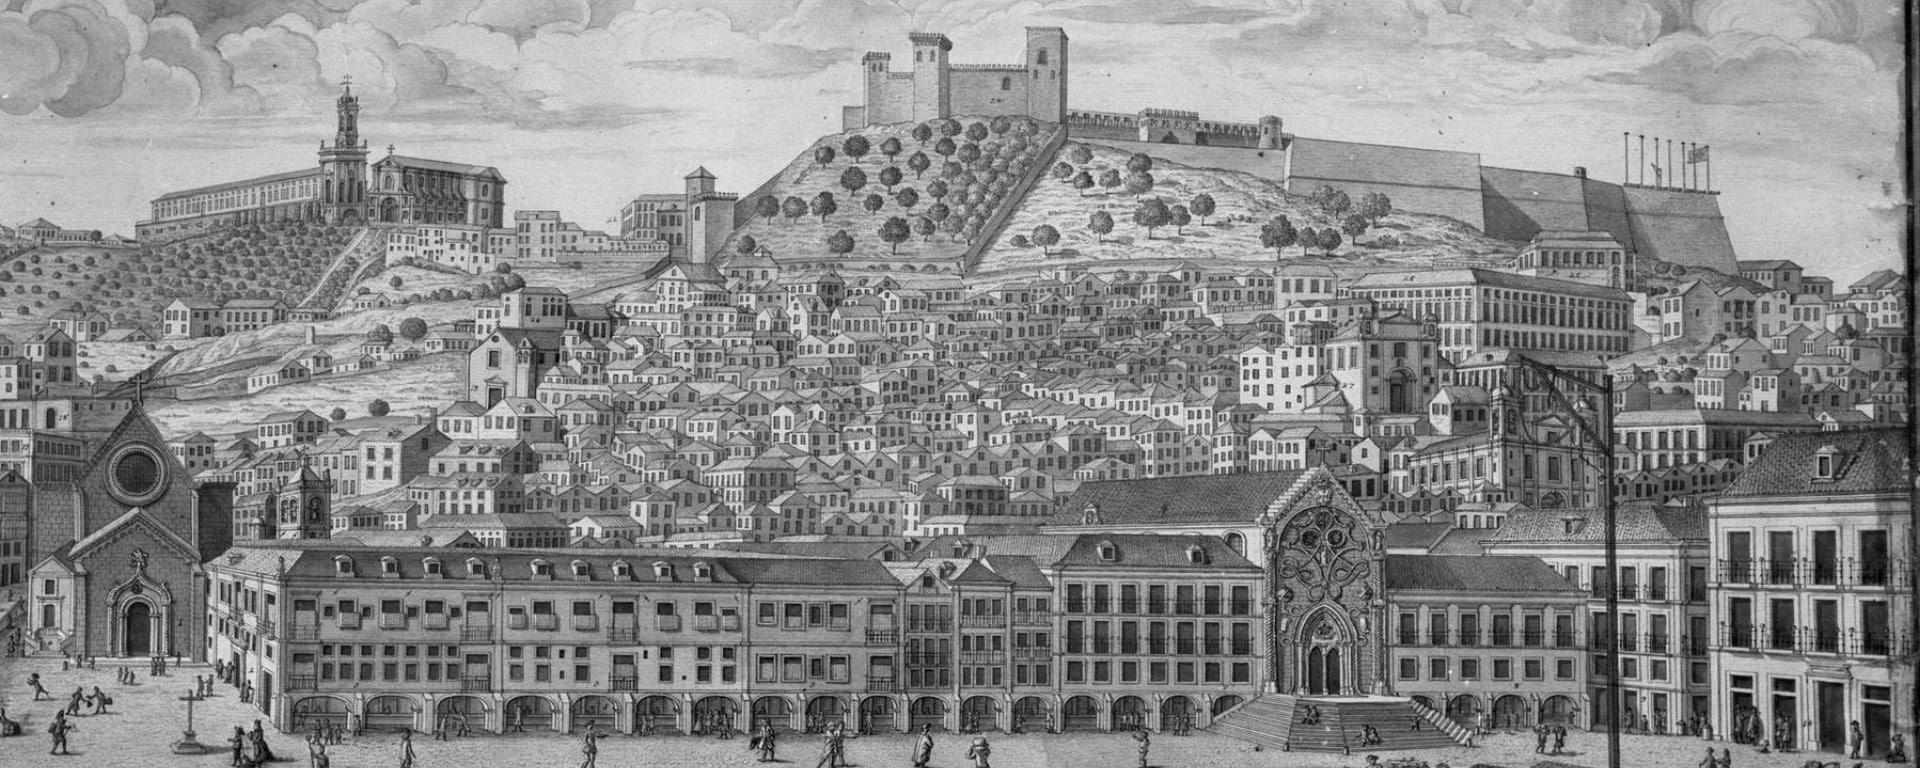 Lisbon history on tour